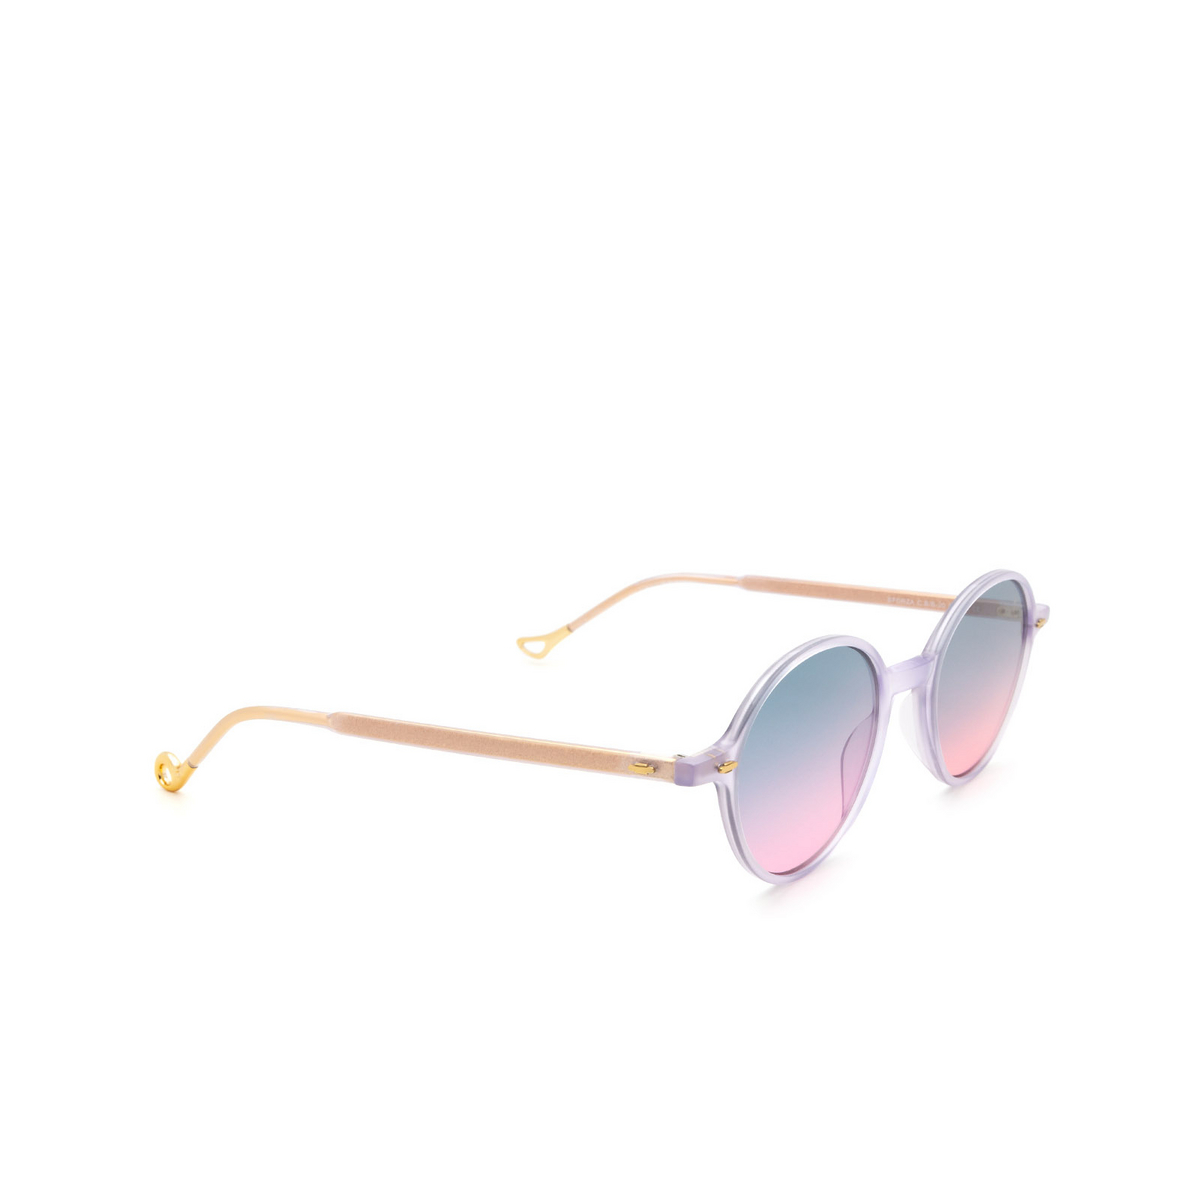 Eyepetizer® Round Sunglasses: Sforza color Lilac C.B/B-20 - three-quarters view.